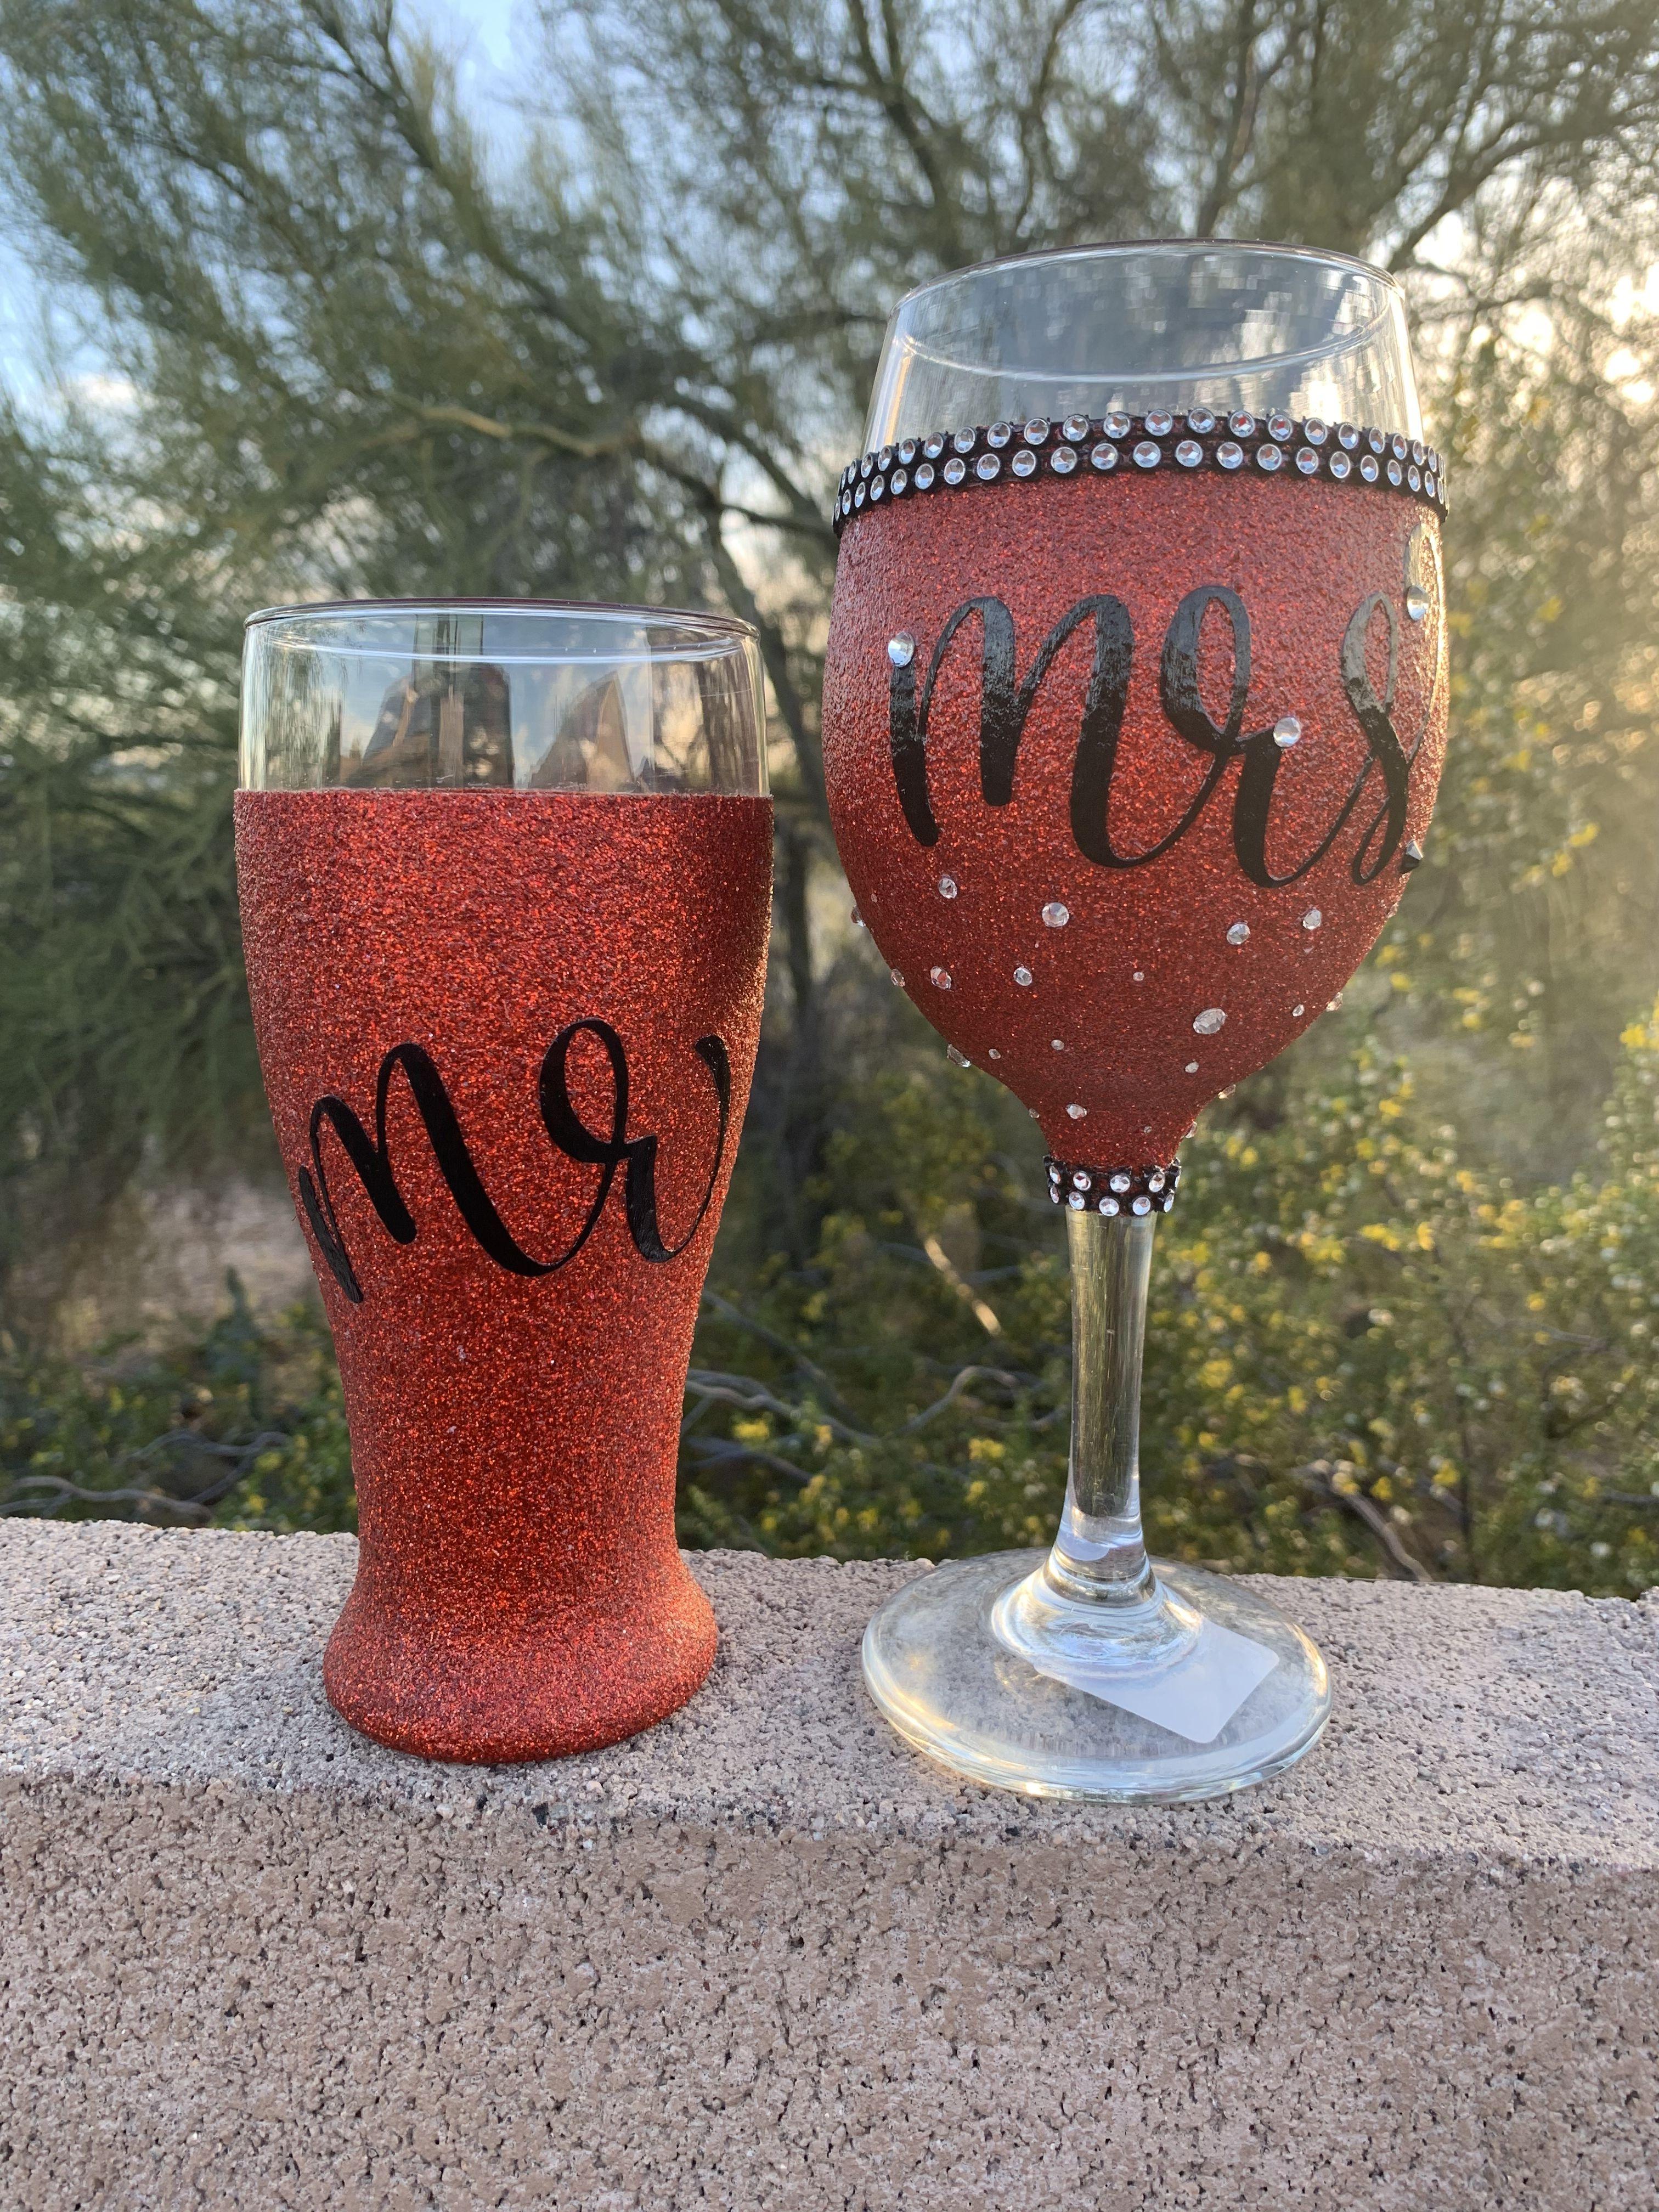 Bride Wine Glass Glitter Wine Glass Wifey Party Gifts Etsy Glitter Wine Glass Diy Wine Glasses Bride Wine Glass